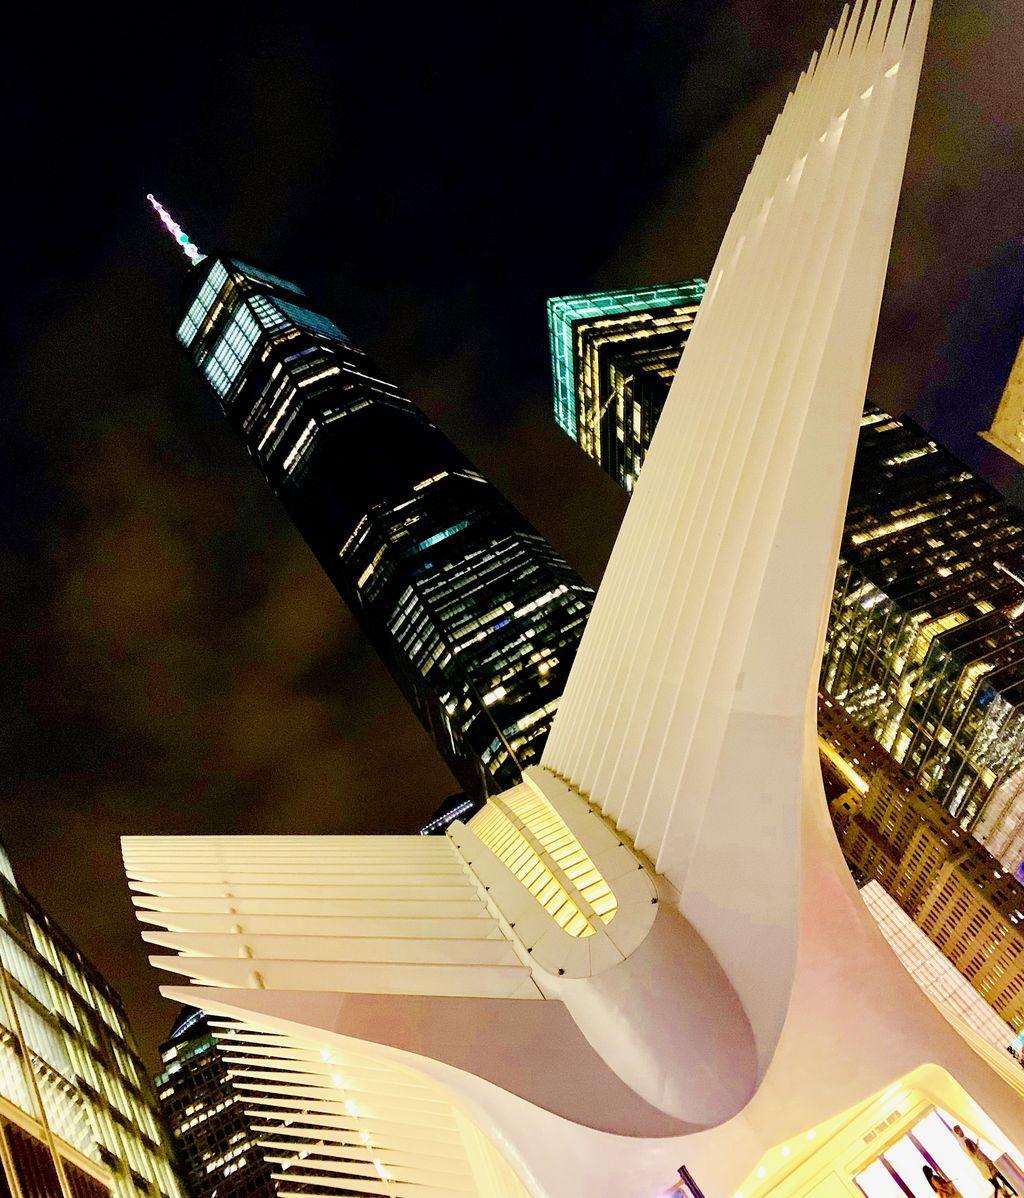 Oculus de Calatrava. © Germán Jiménez